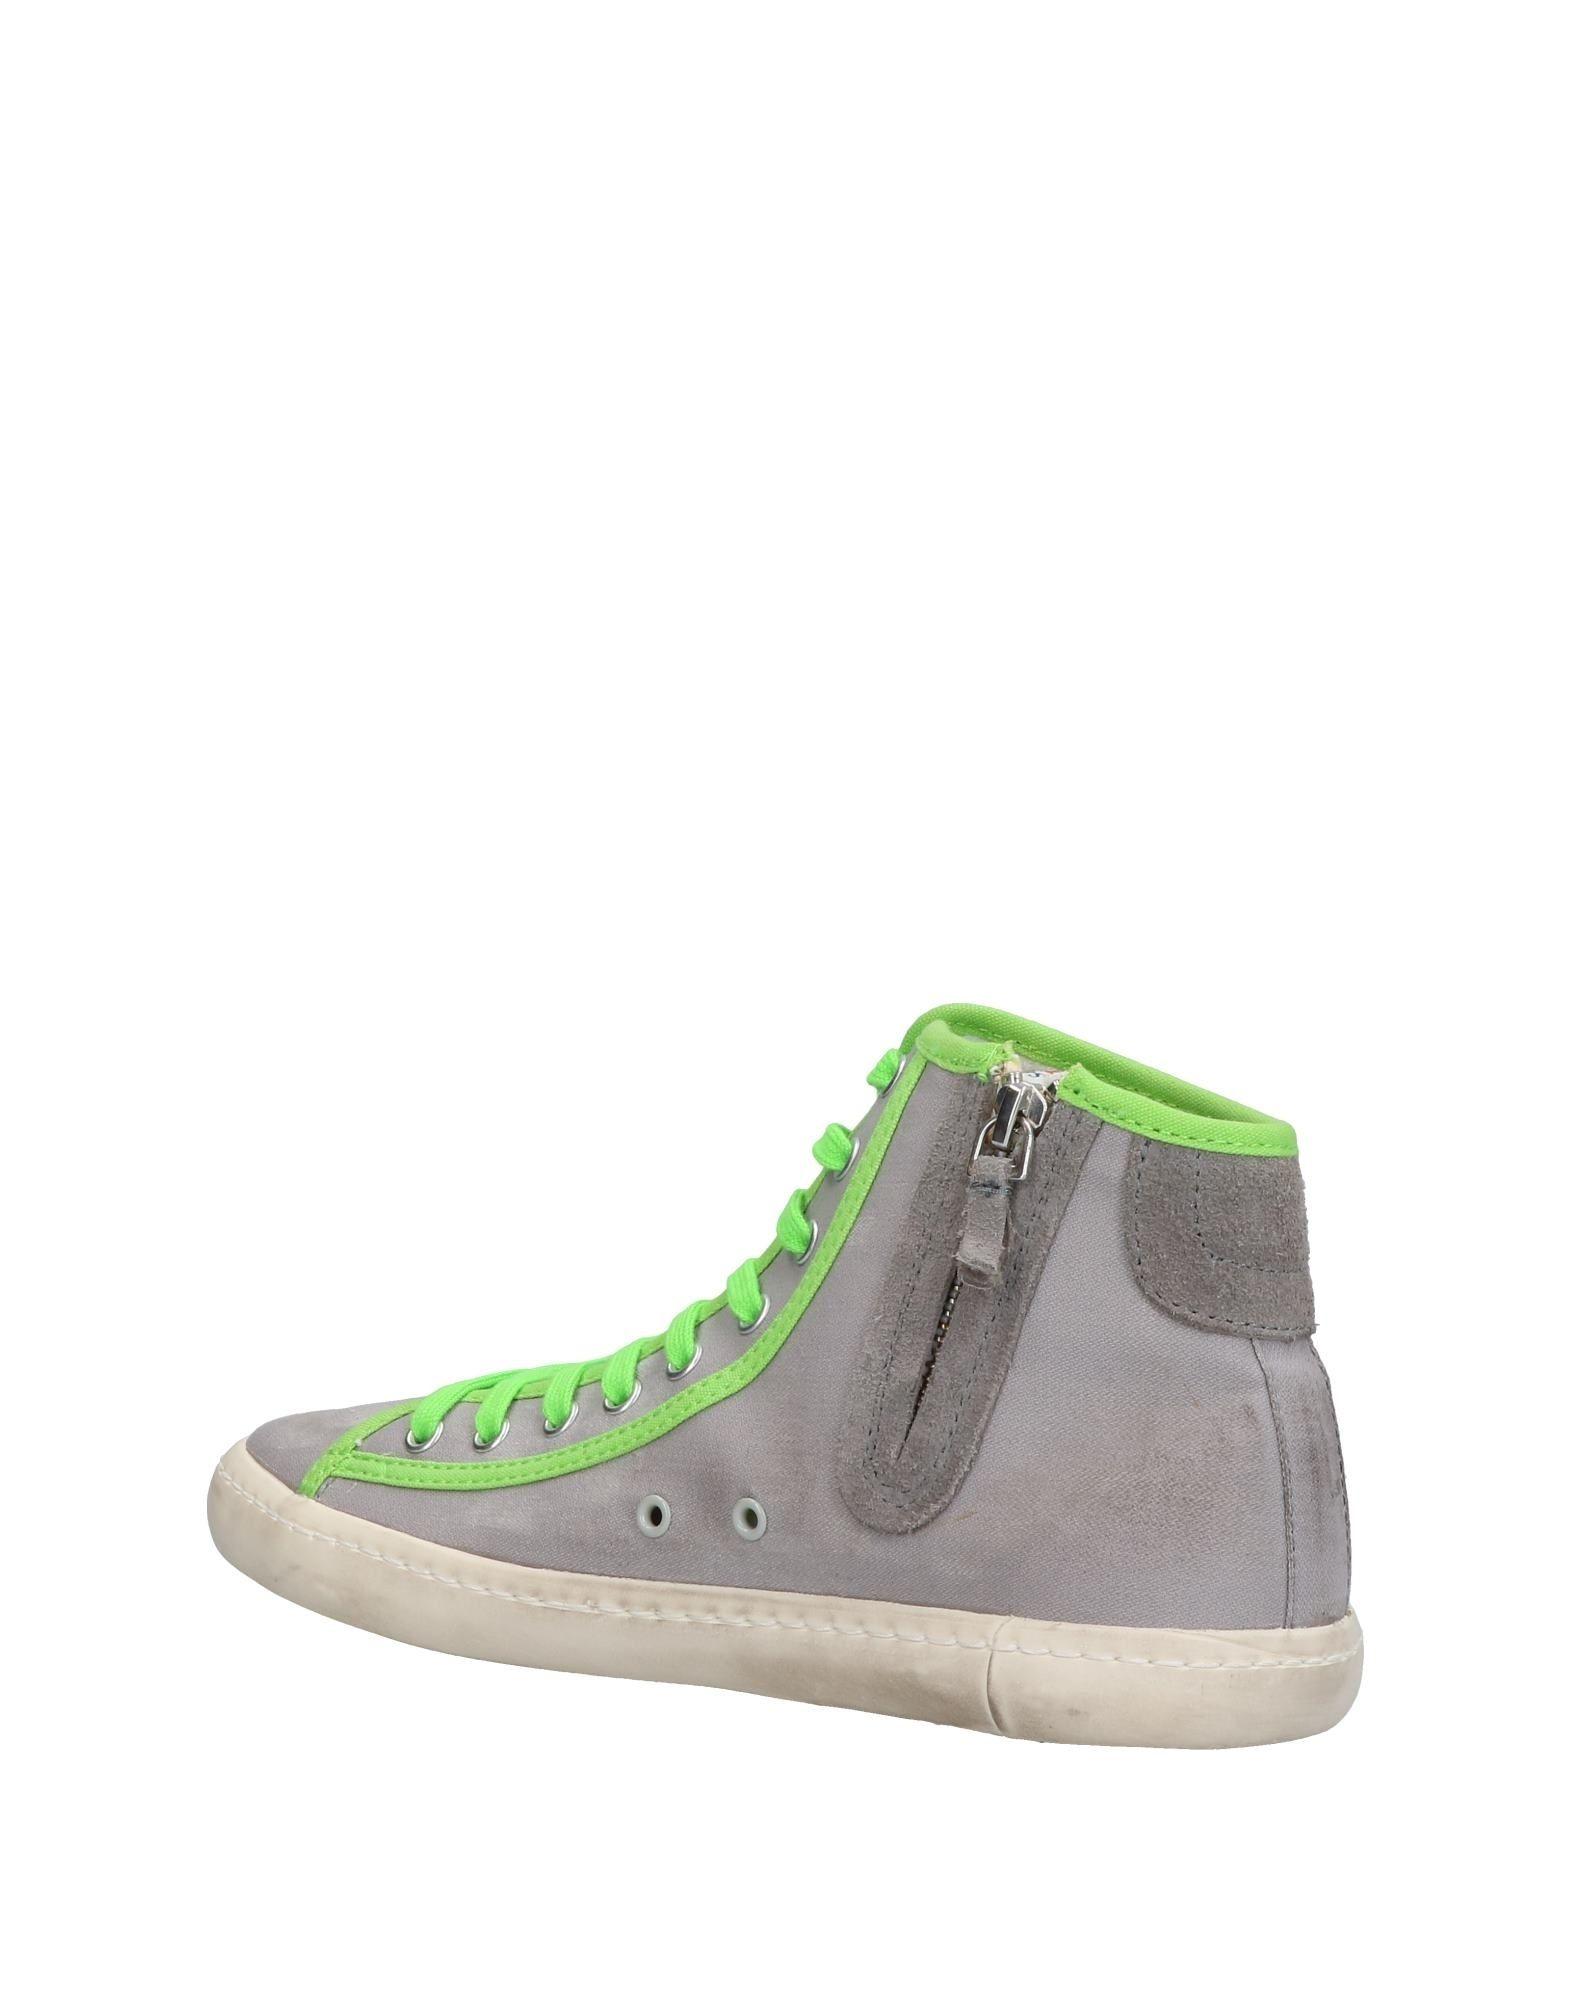 D.A.T.E. Sneakers Sneakers Sneakers Herren  11357514MW Heiße Schuhe 3064f2